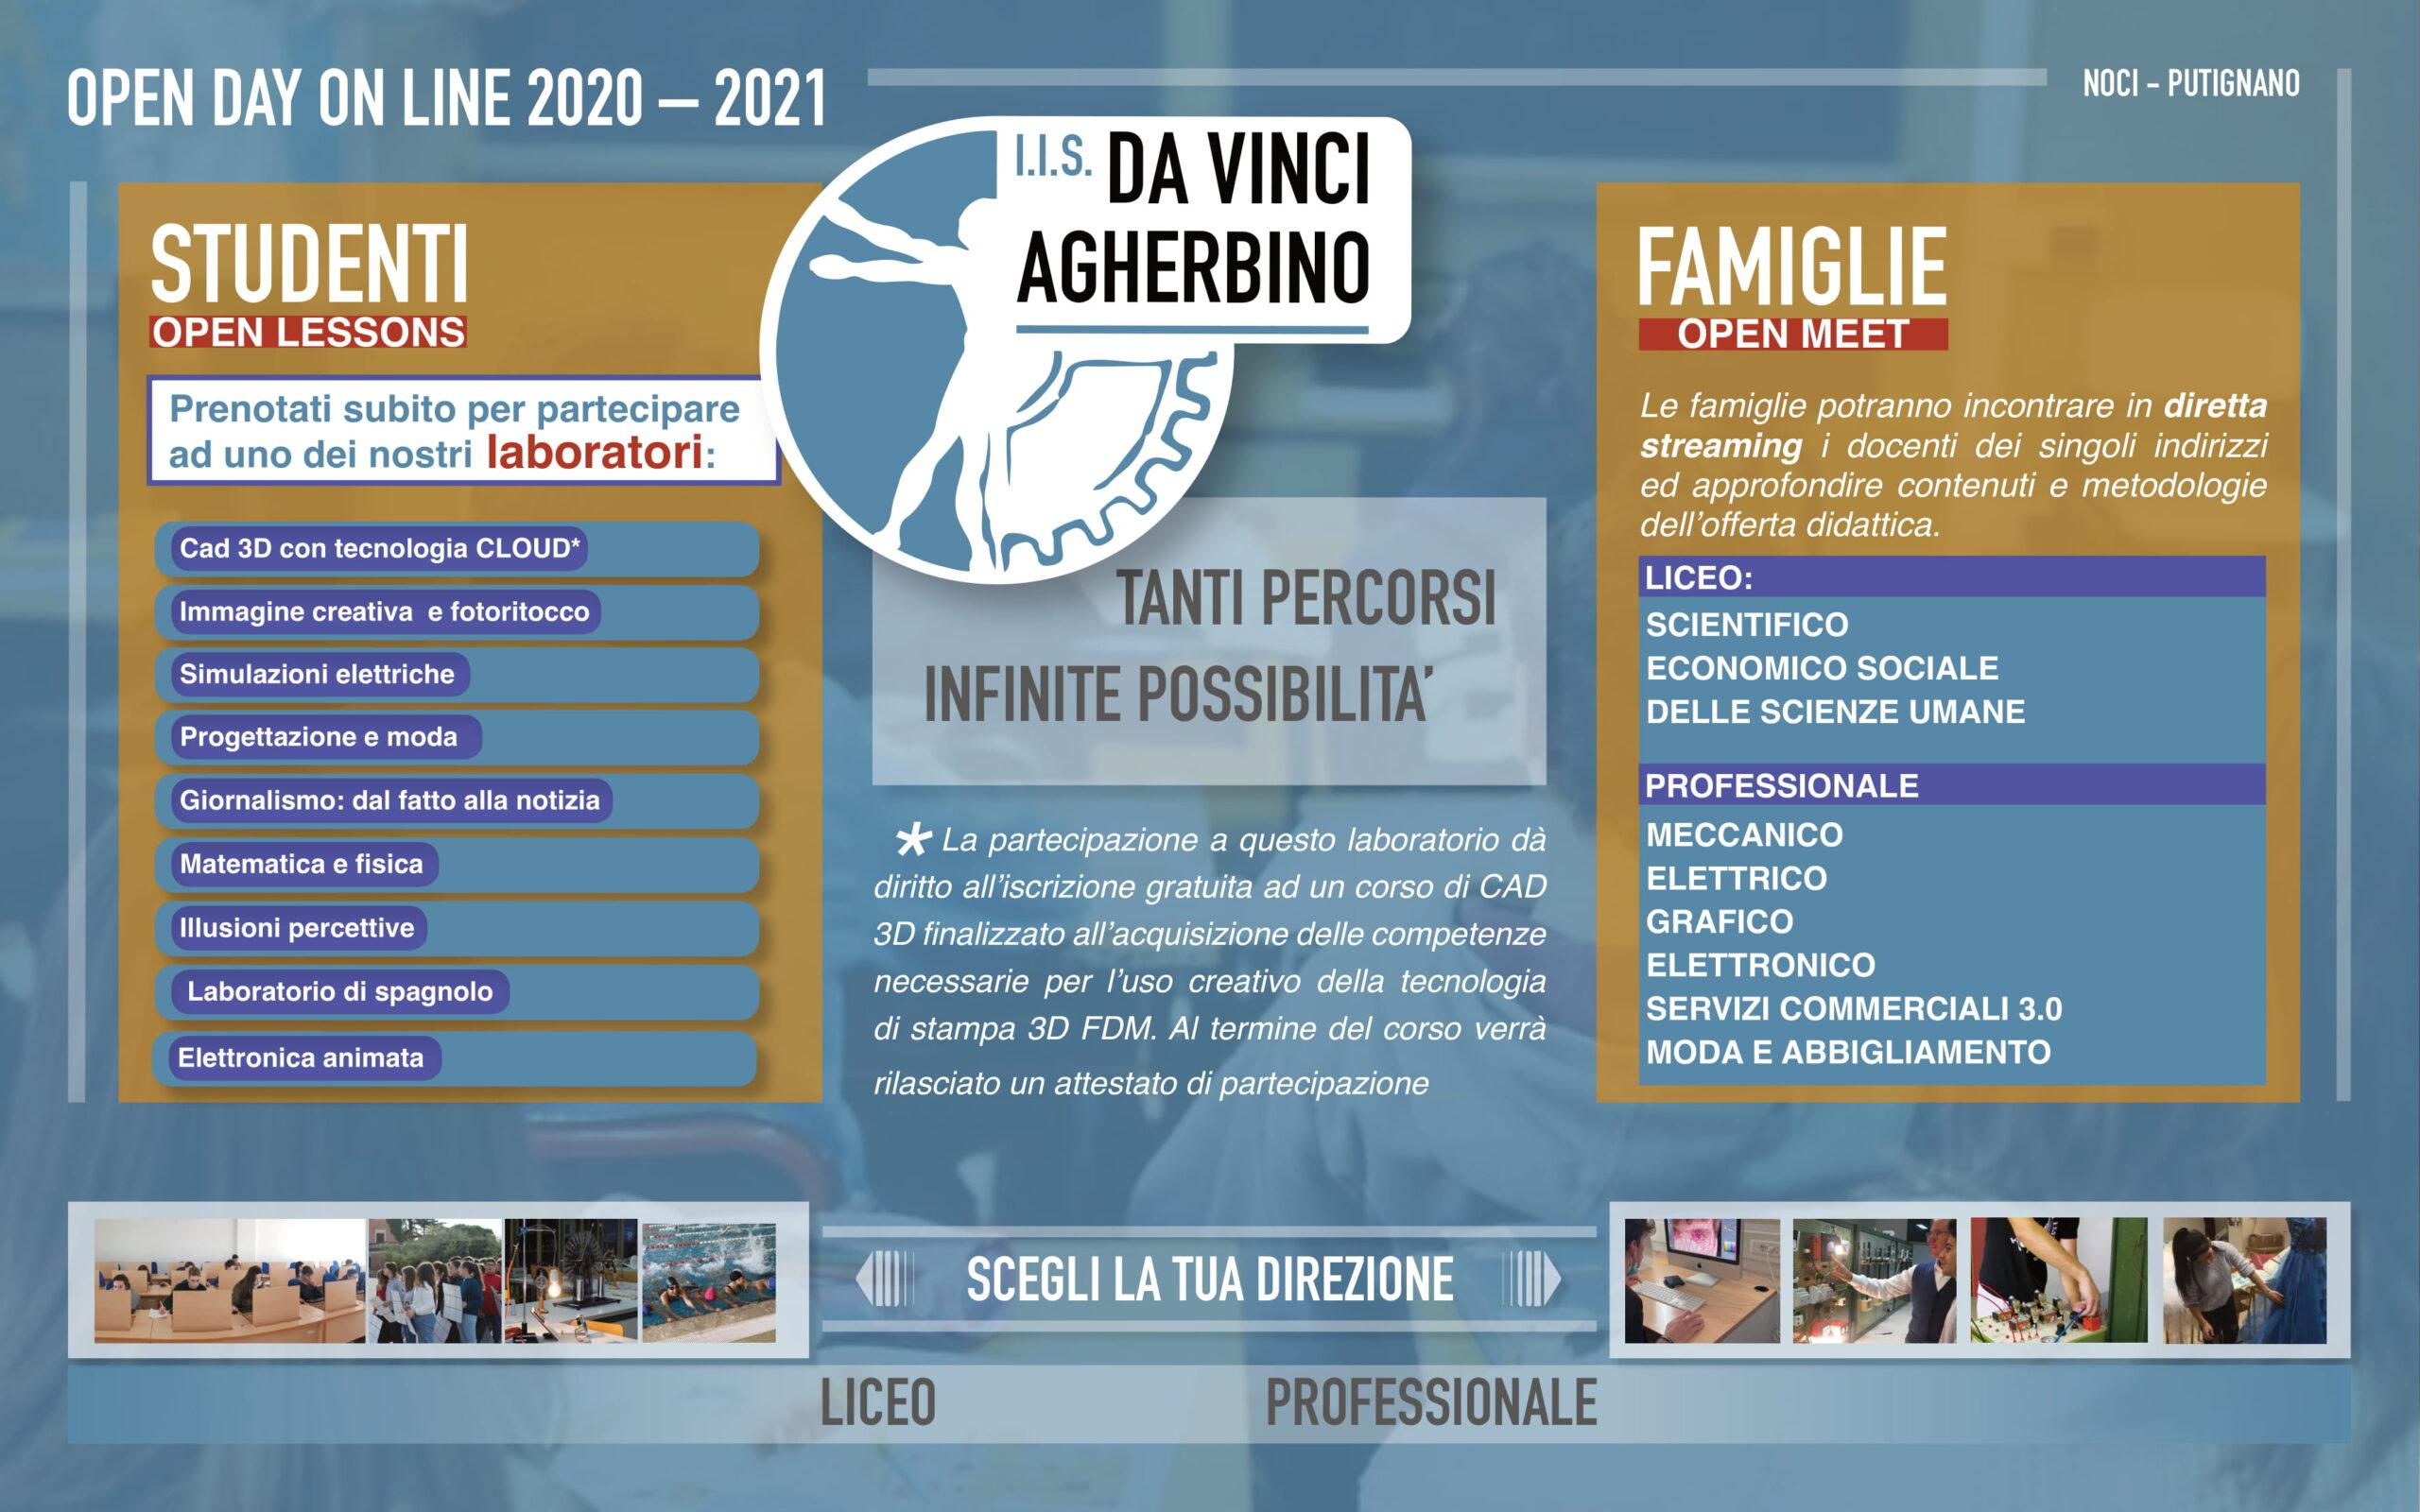 locandina orientamento 2020/21